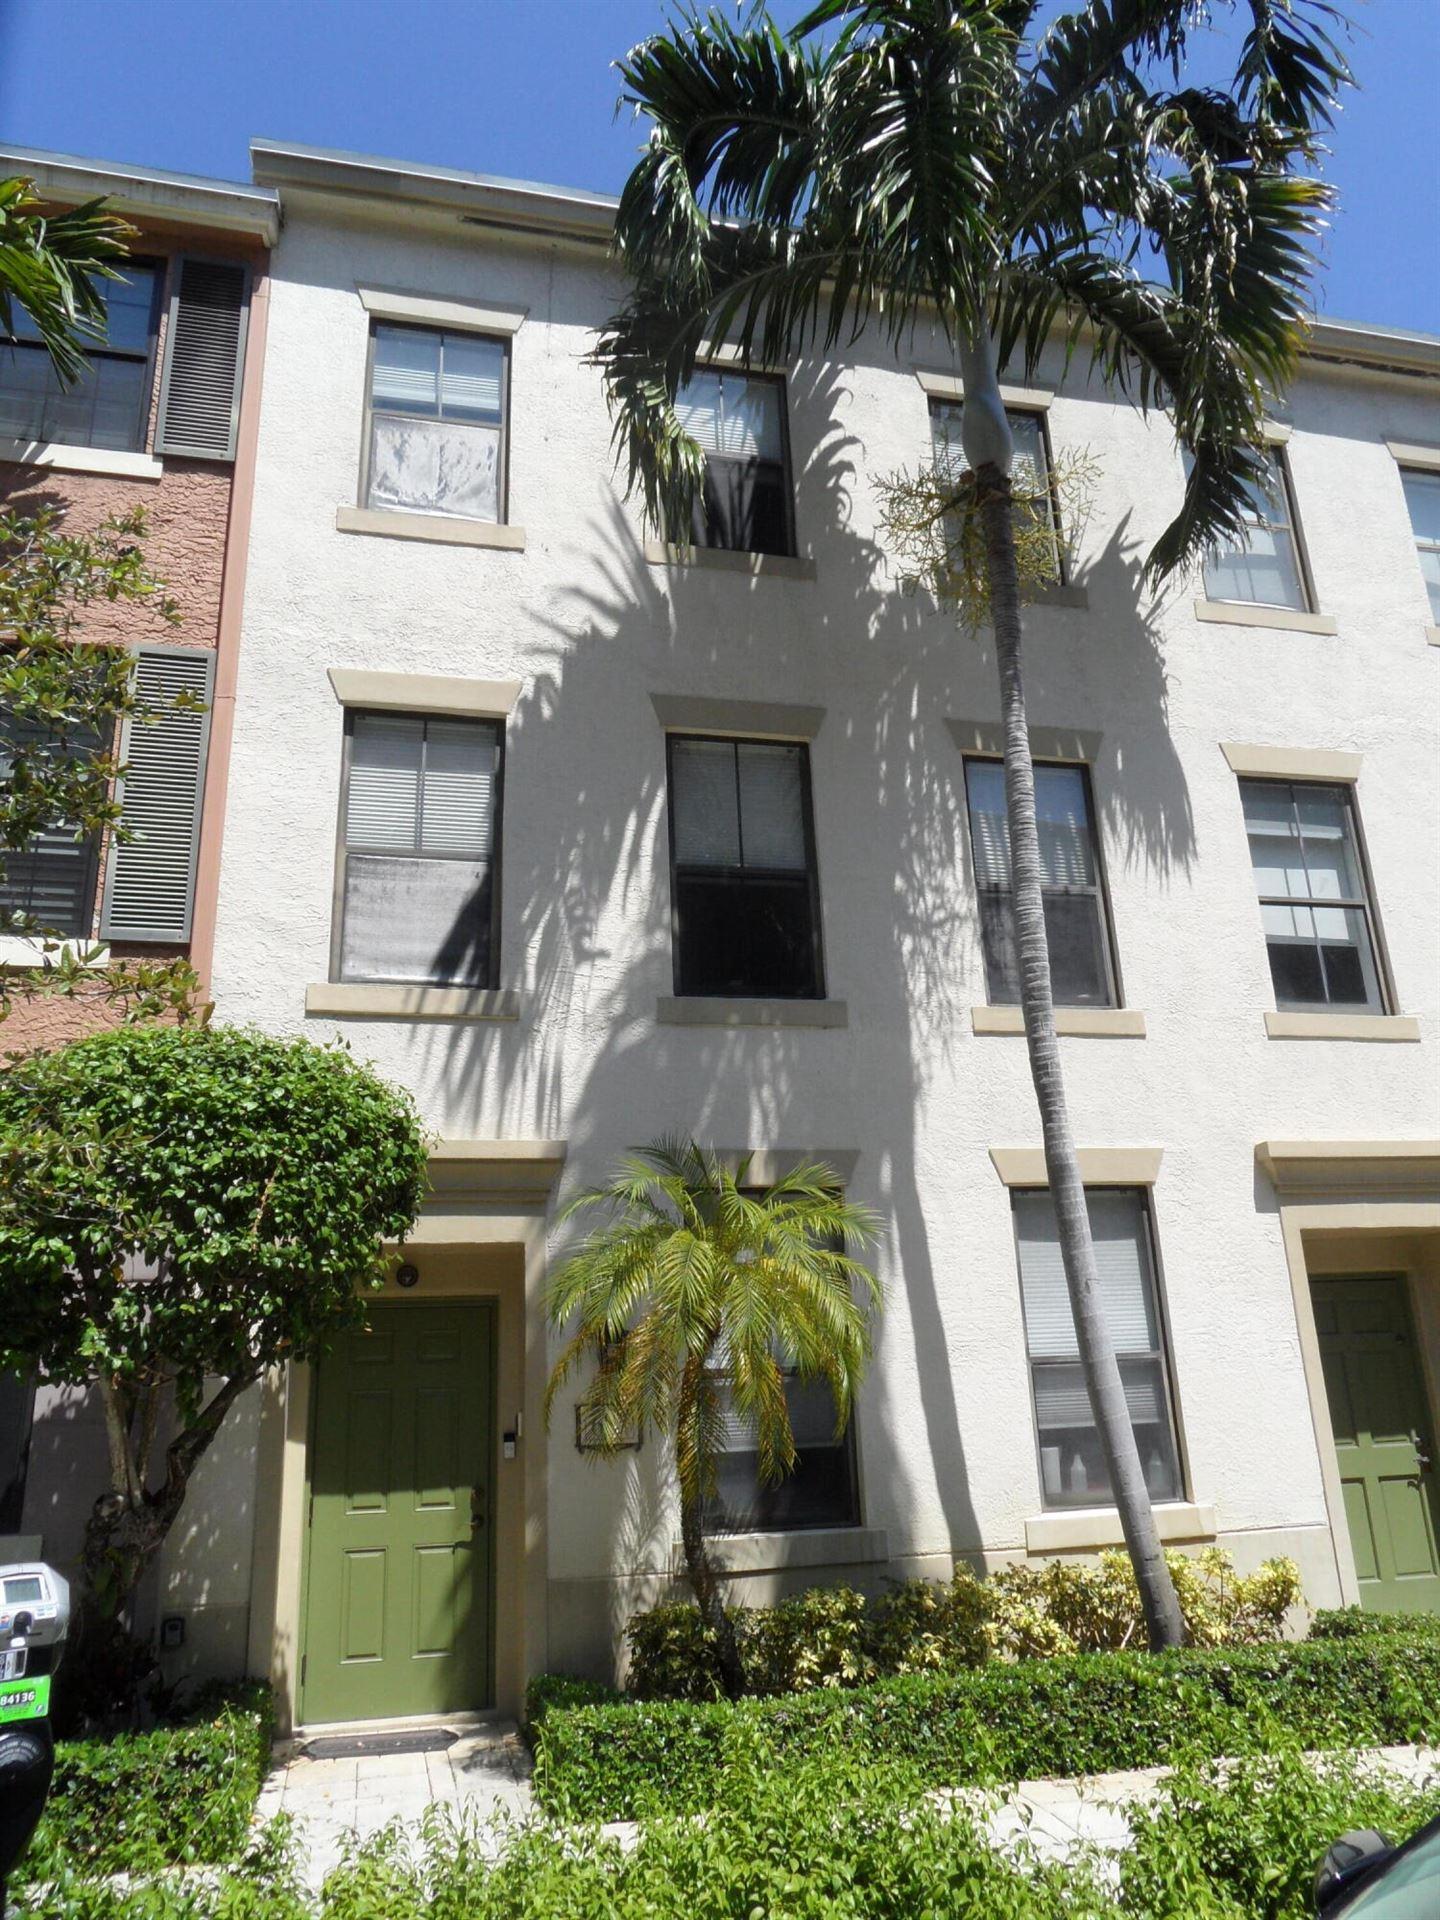 687 Hibiscus Street, West Palm Beach, FL 33401 - #: RX-10746183